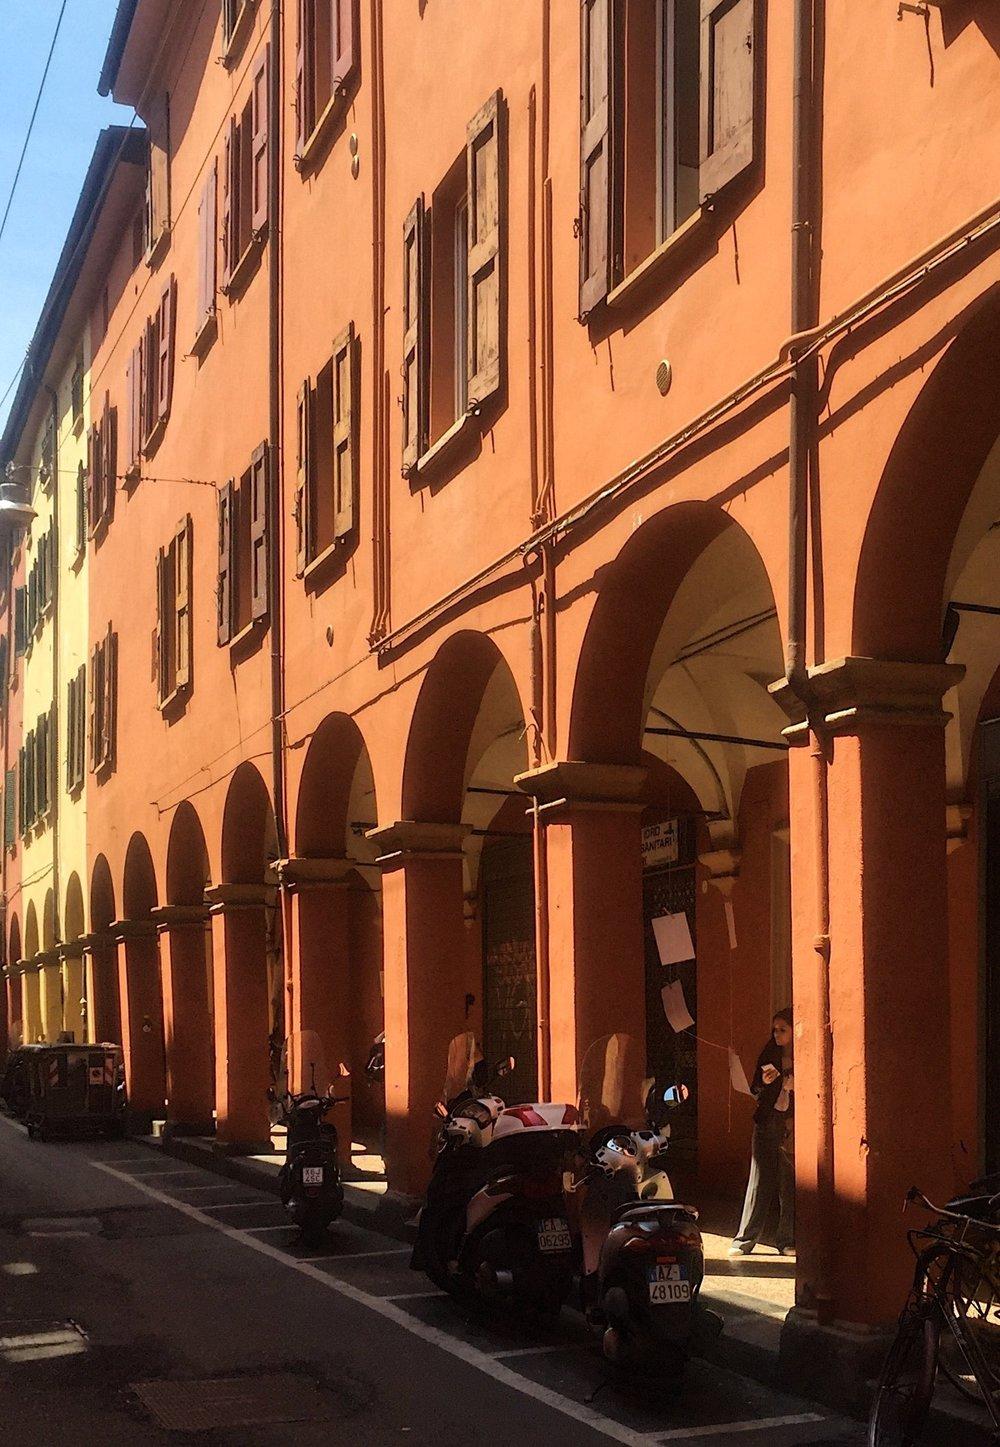 Arches of Bologna